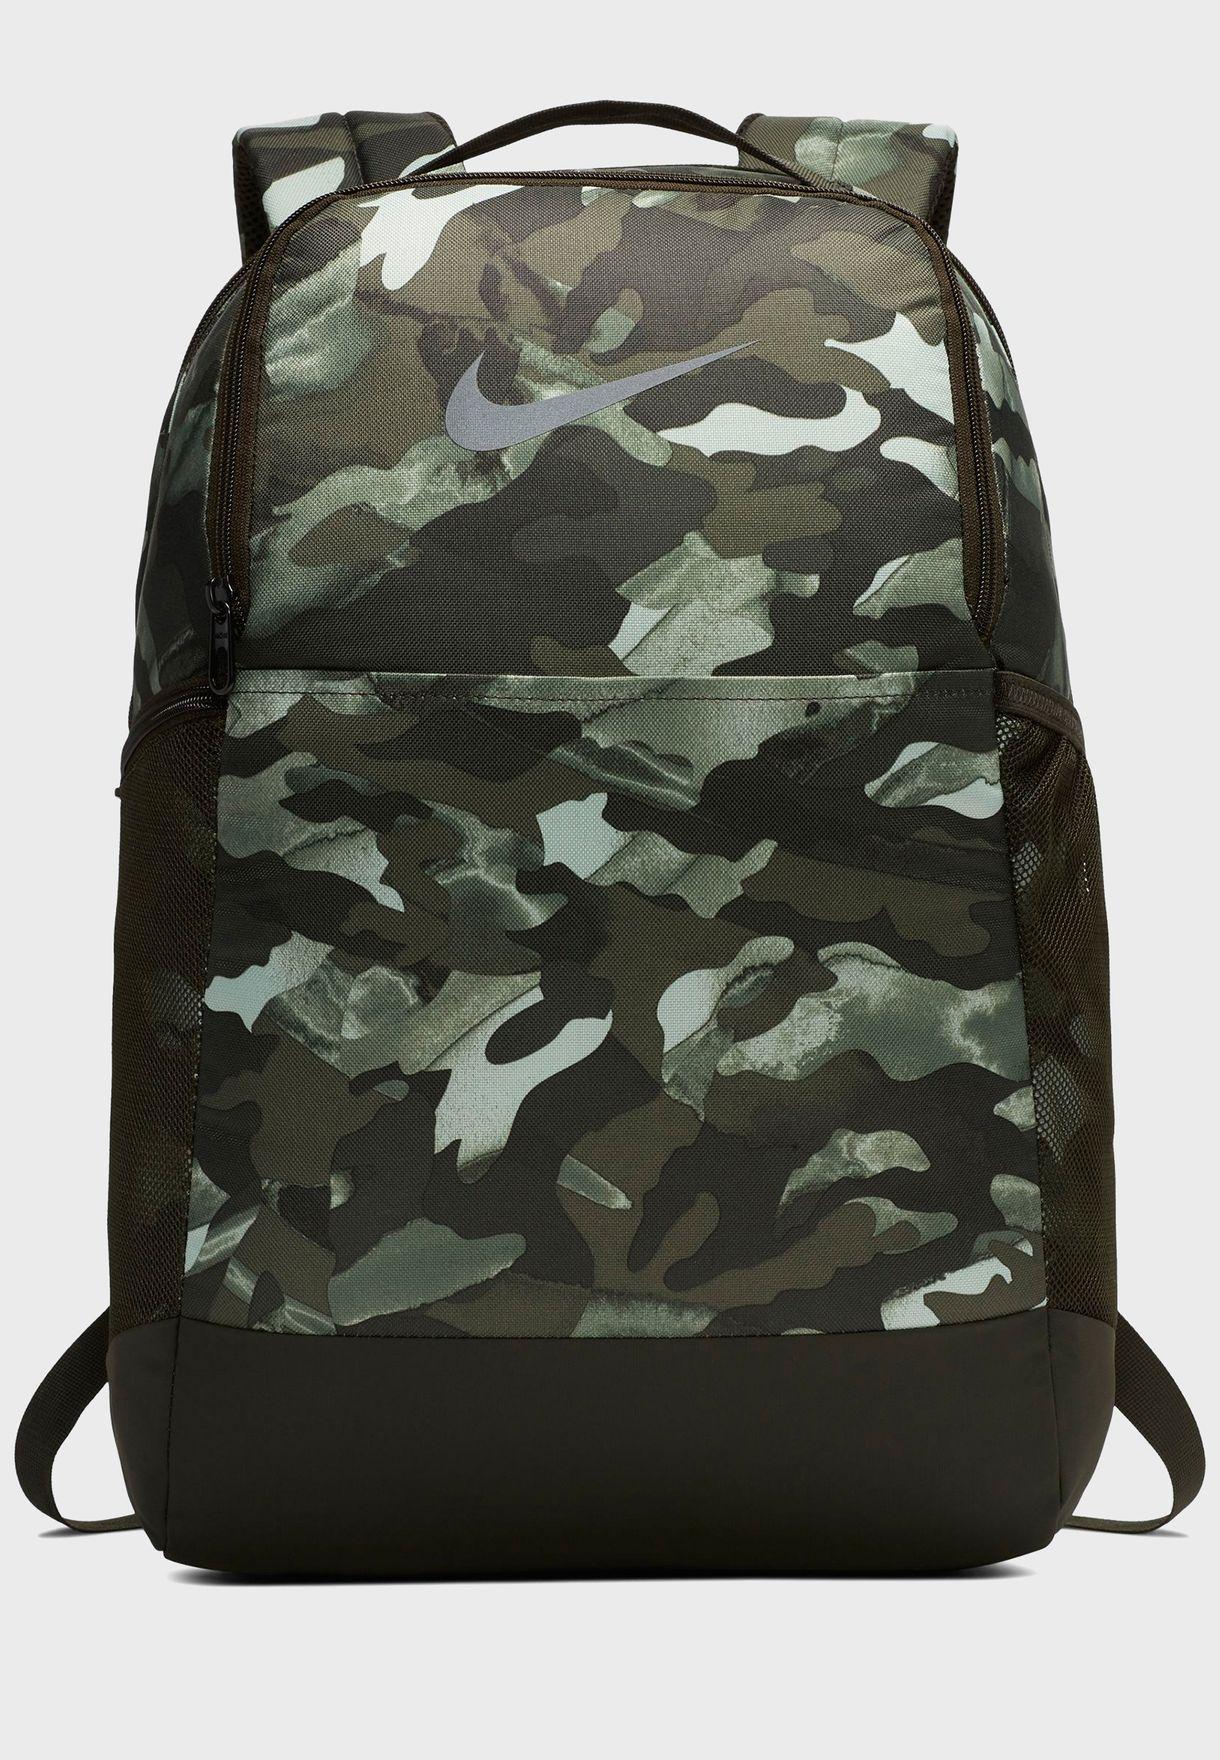 Medium Brasilia 9.0 AOP 2 Backpack